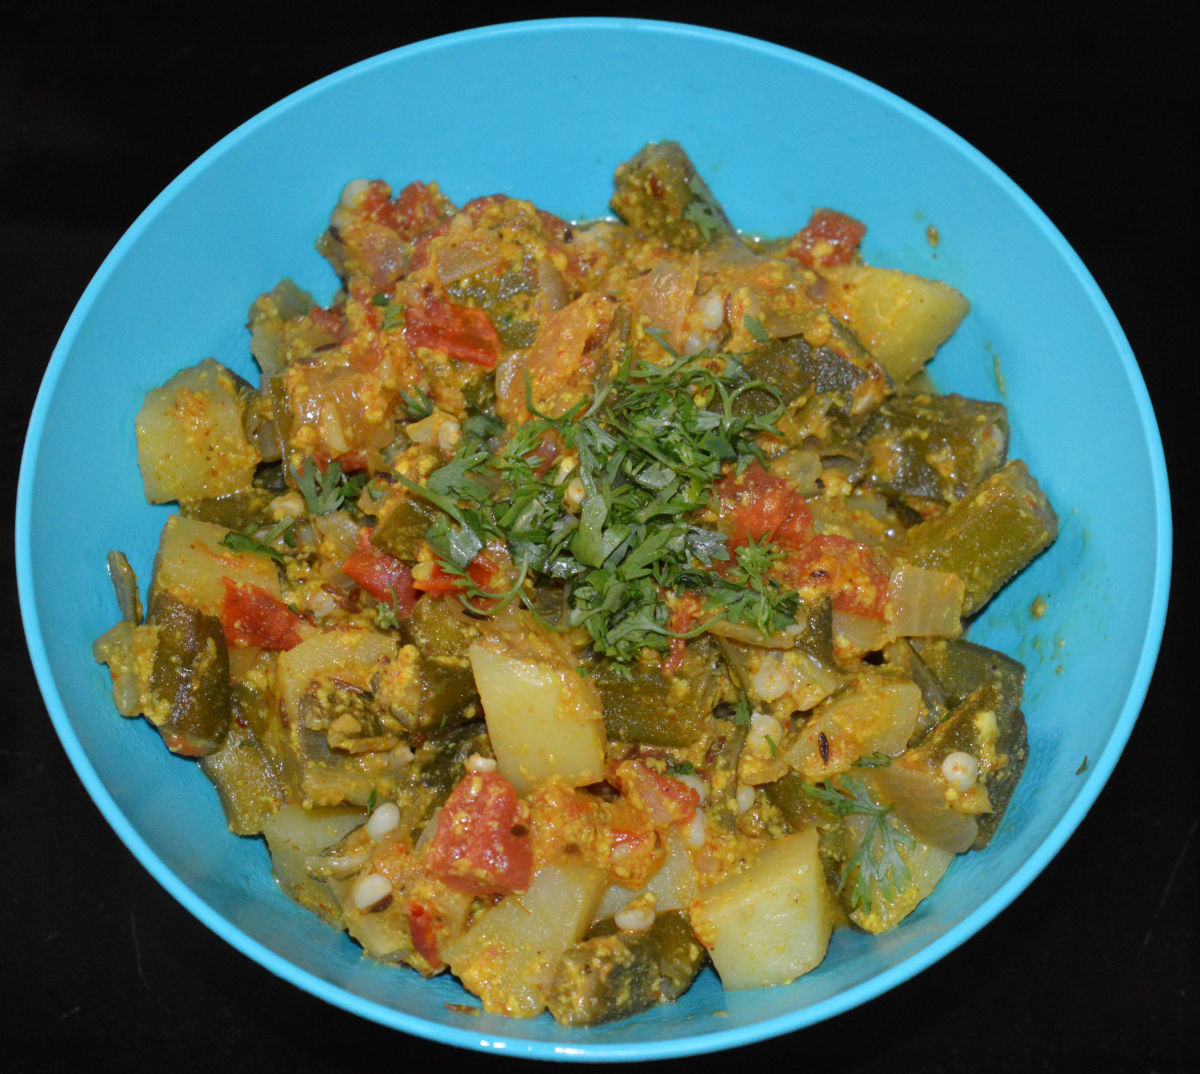 Yogurt-based okra potato curry.